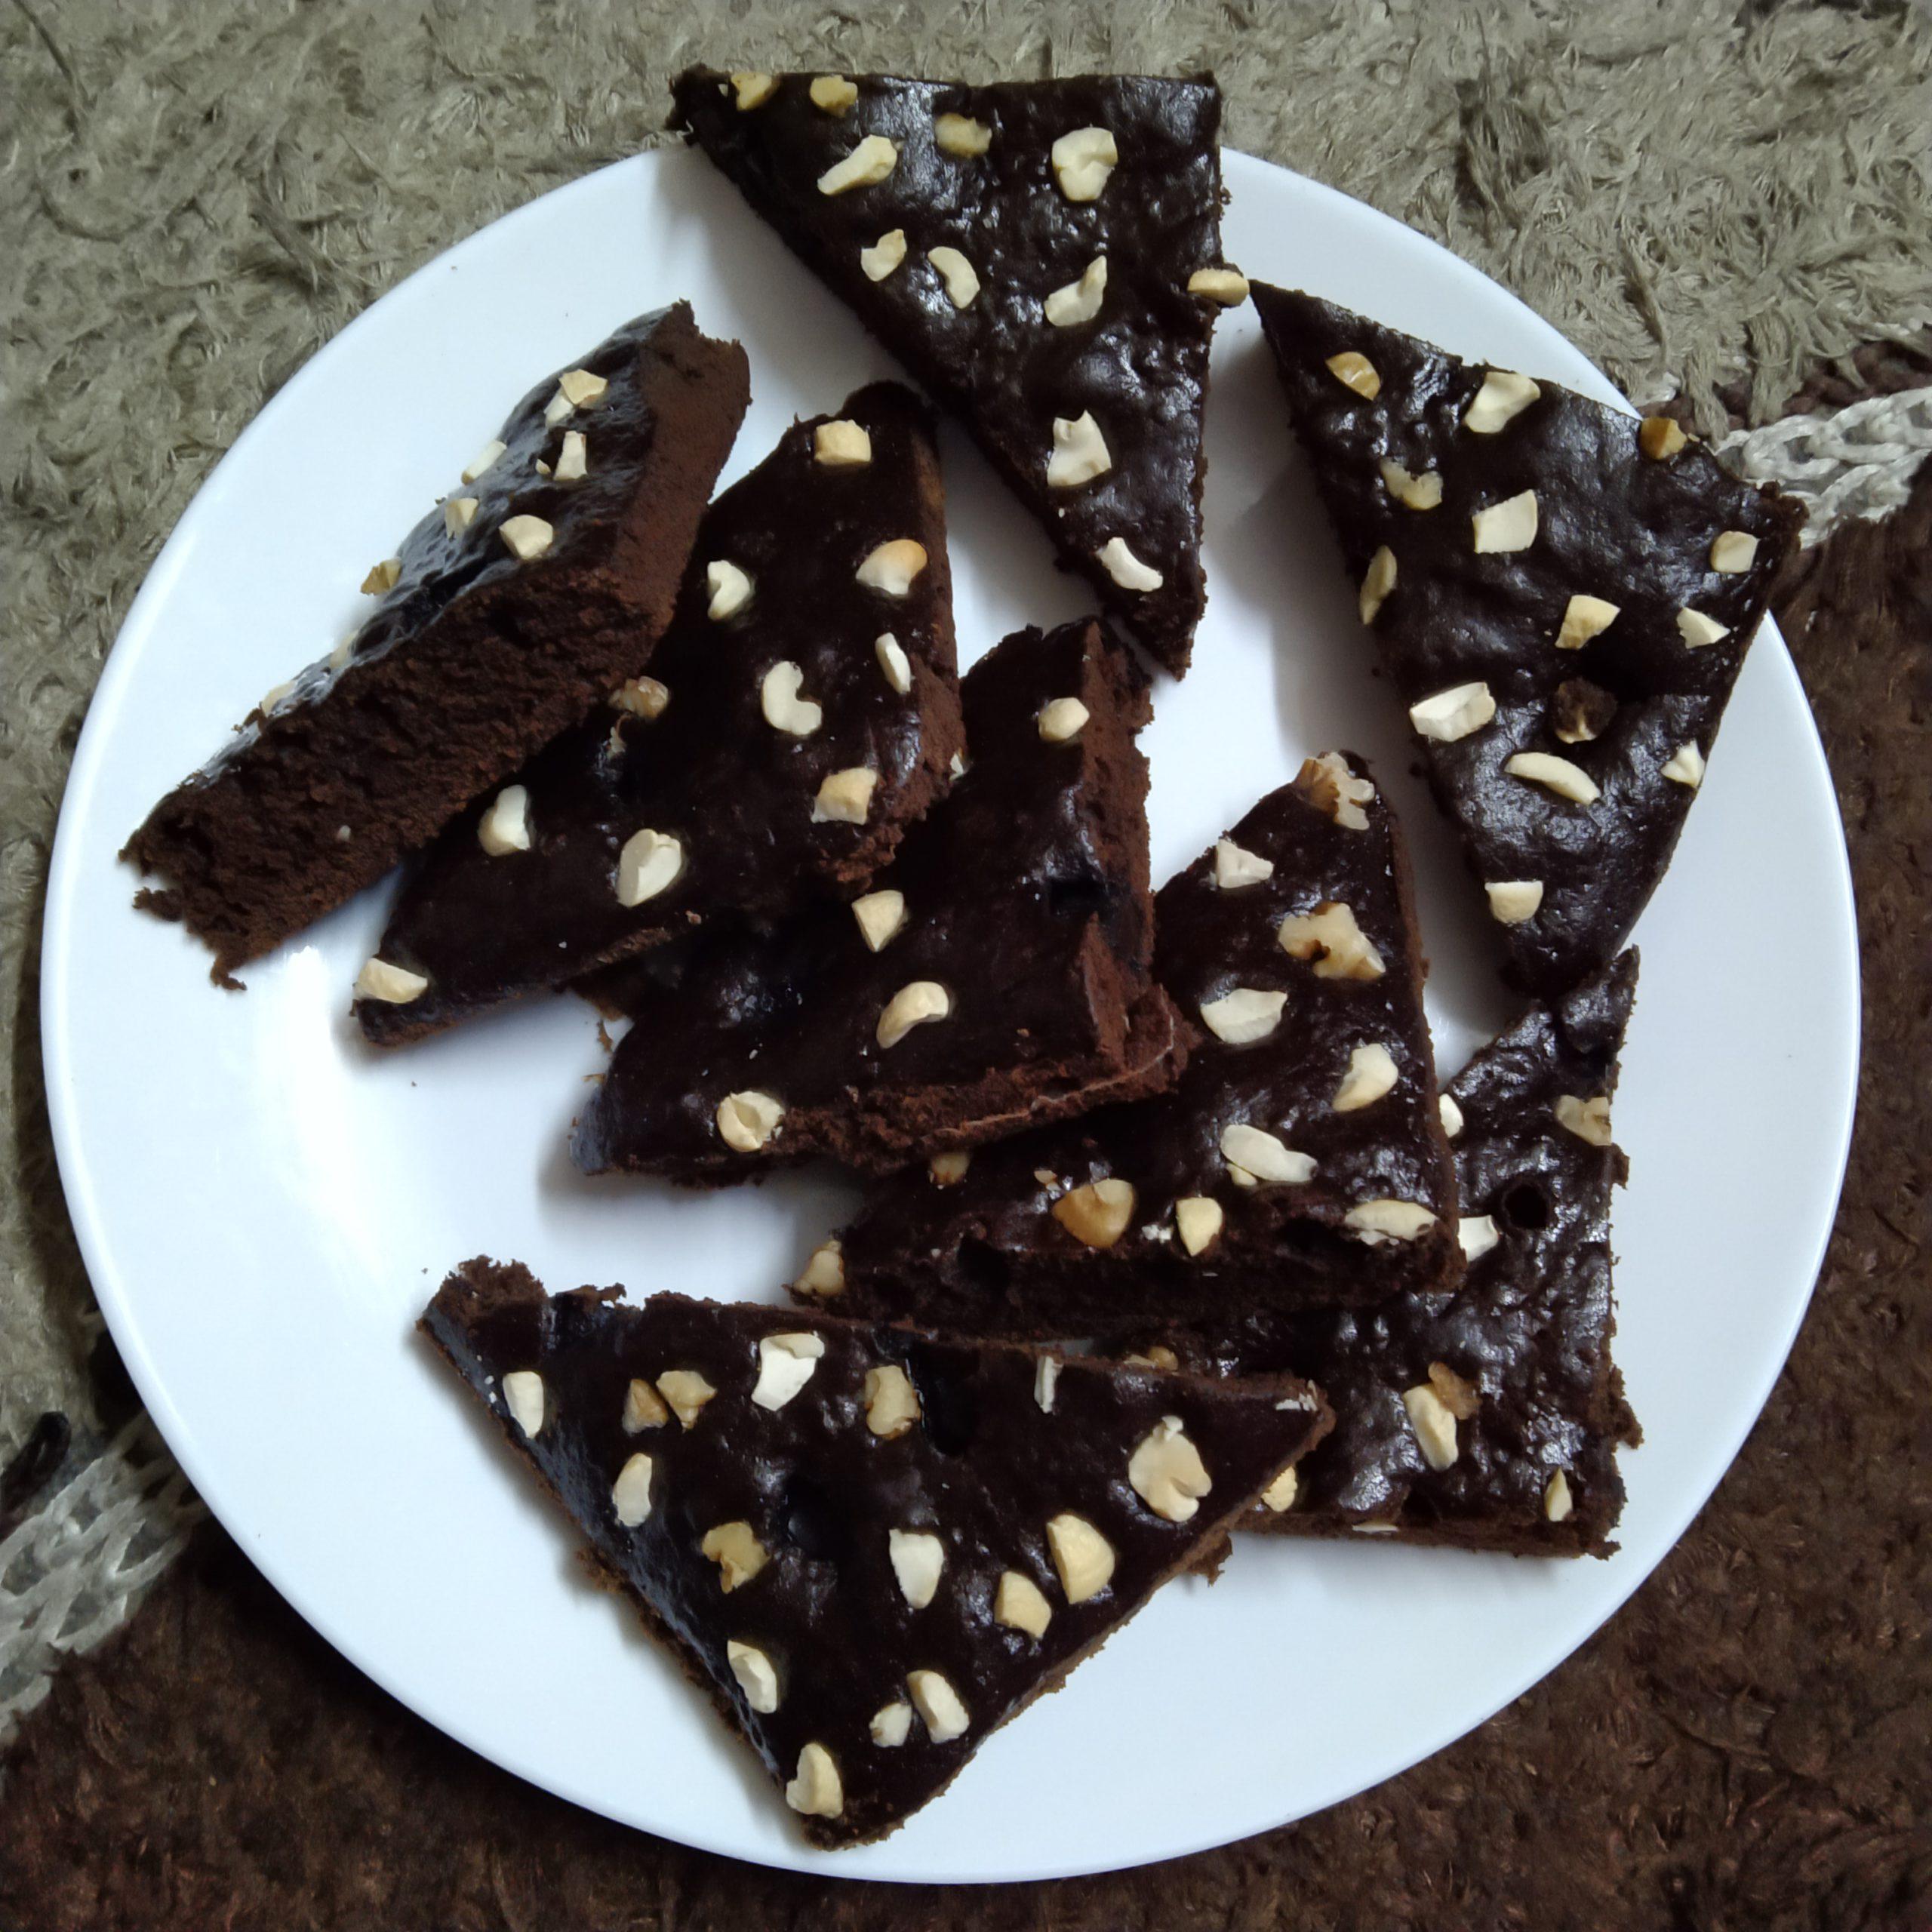 Walnut Brownie(10 pieces) Designs, Images, Price Near Me